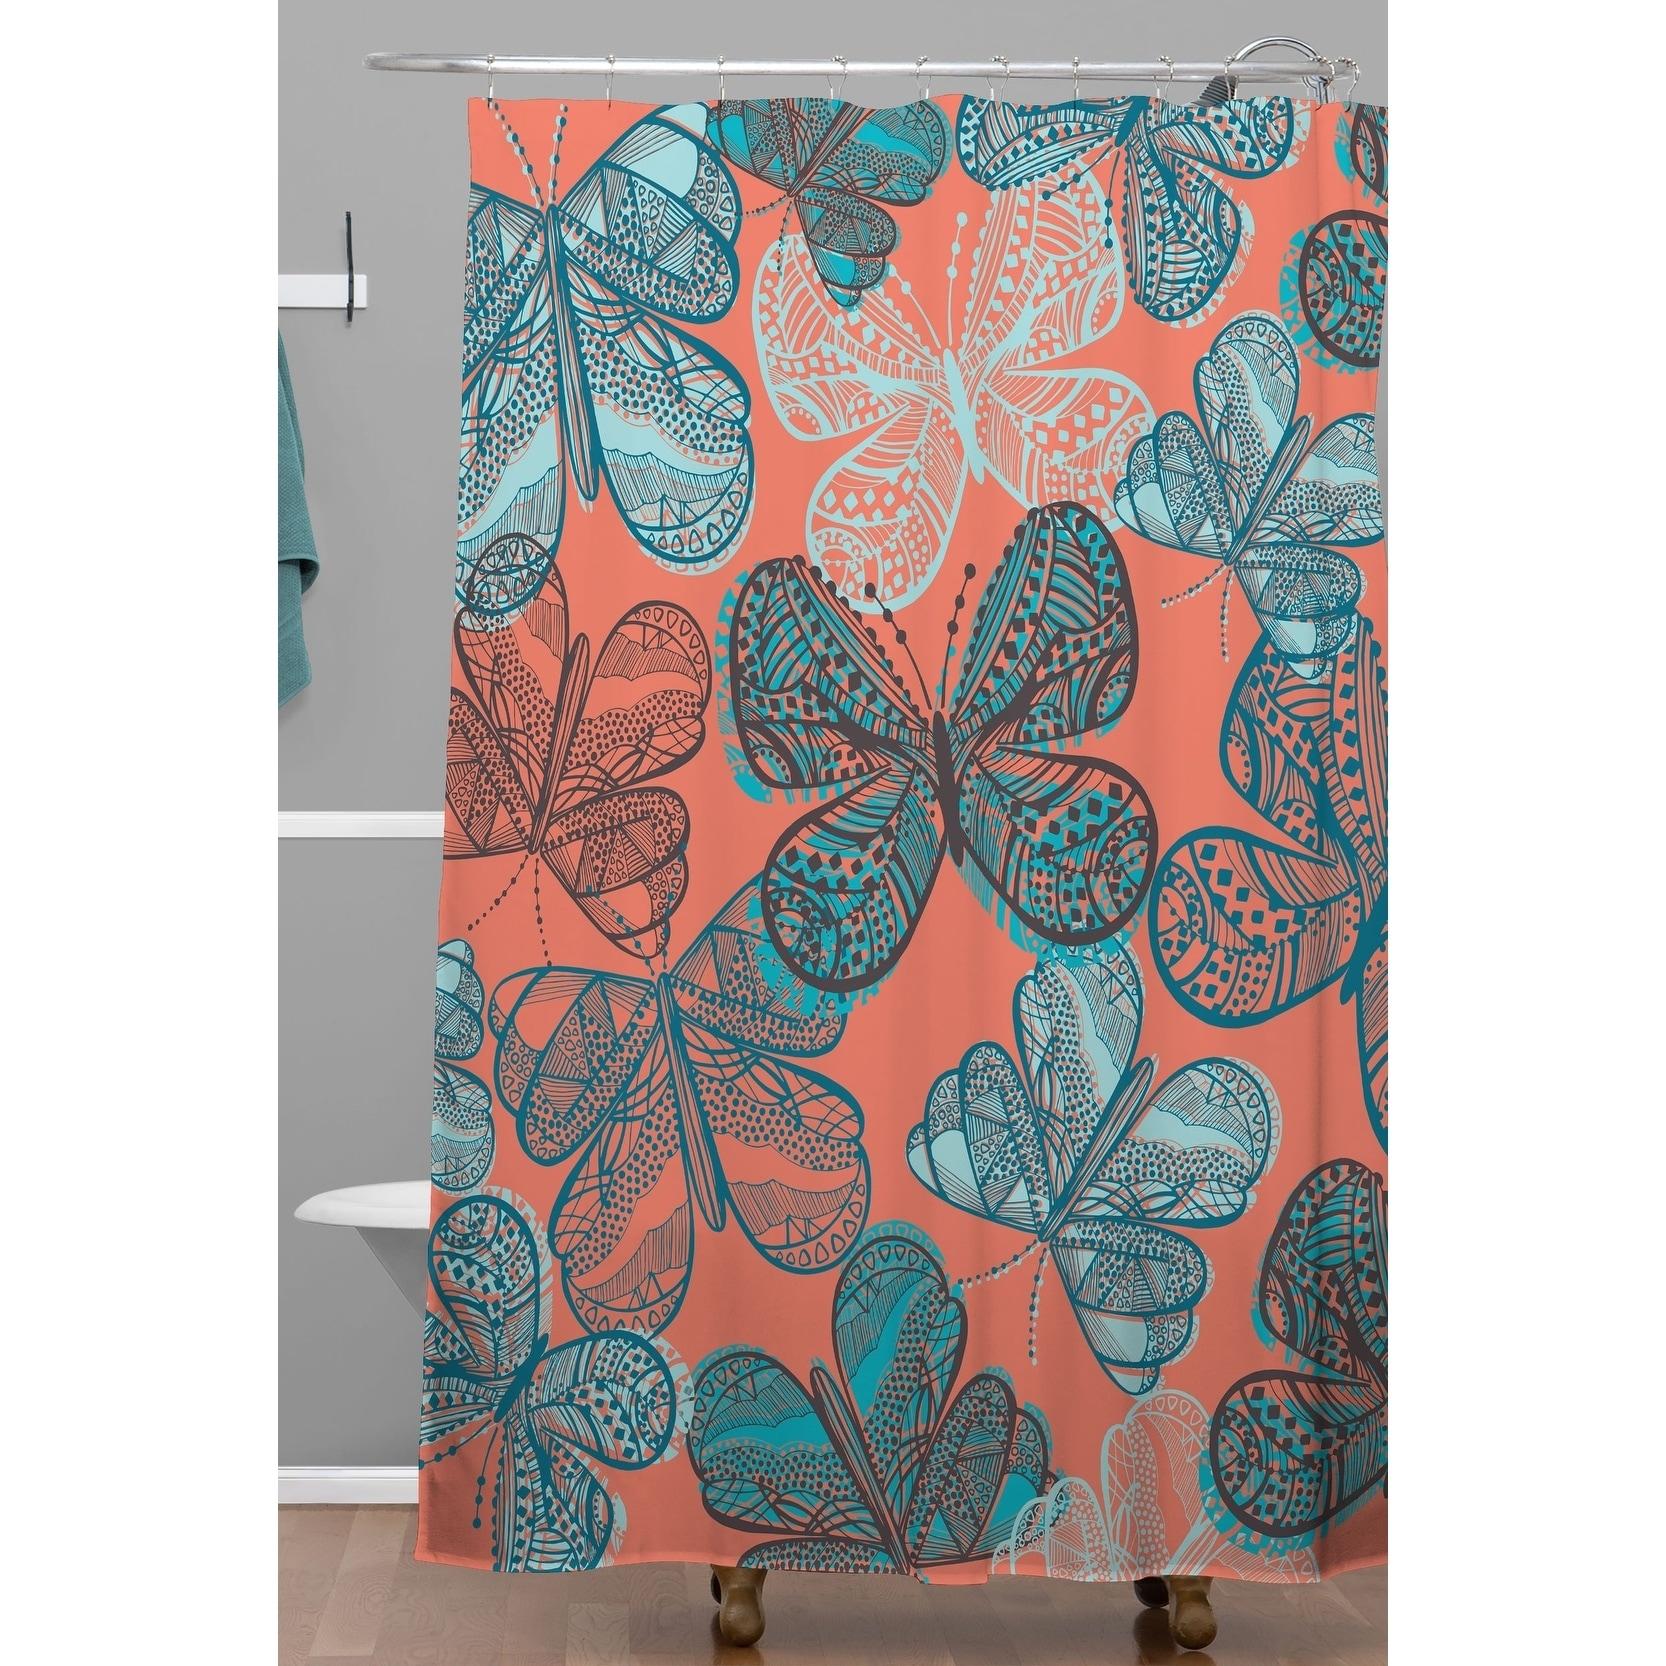 Shop Black Friday Deals On Deny Designs Havana Butterfly Shower Curtain Overstock 29812924